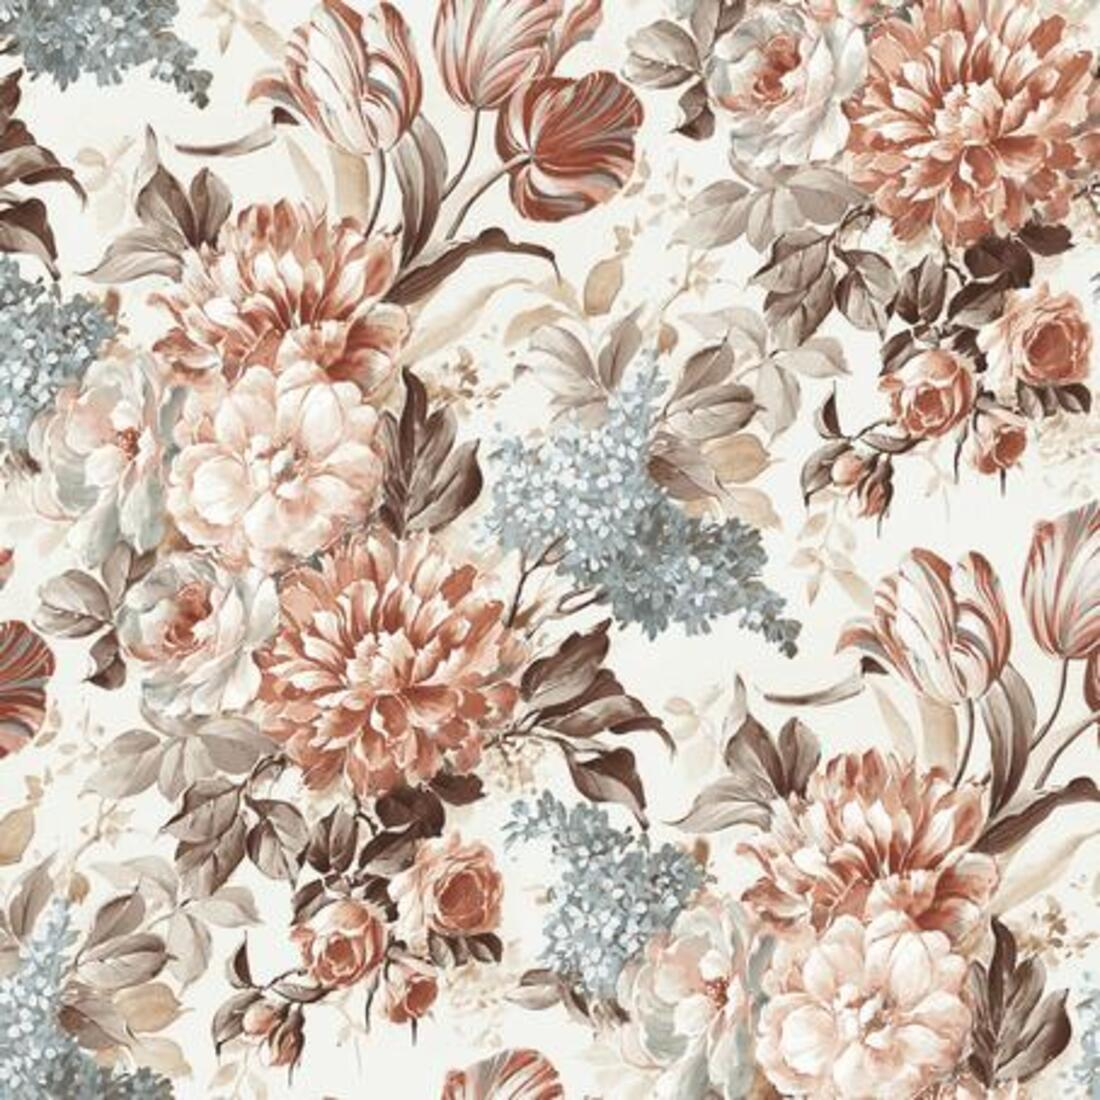 Мебельная ткань Flowers Beige 55143/1018, велюр з принтом